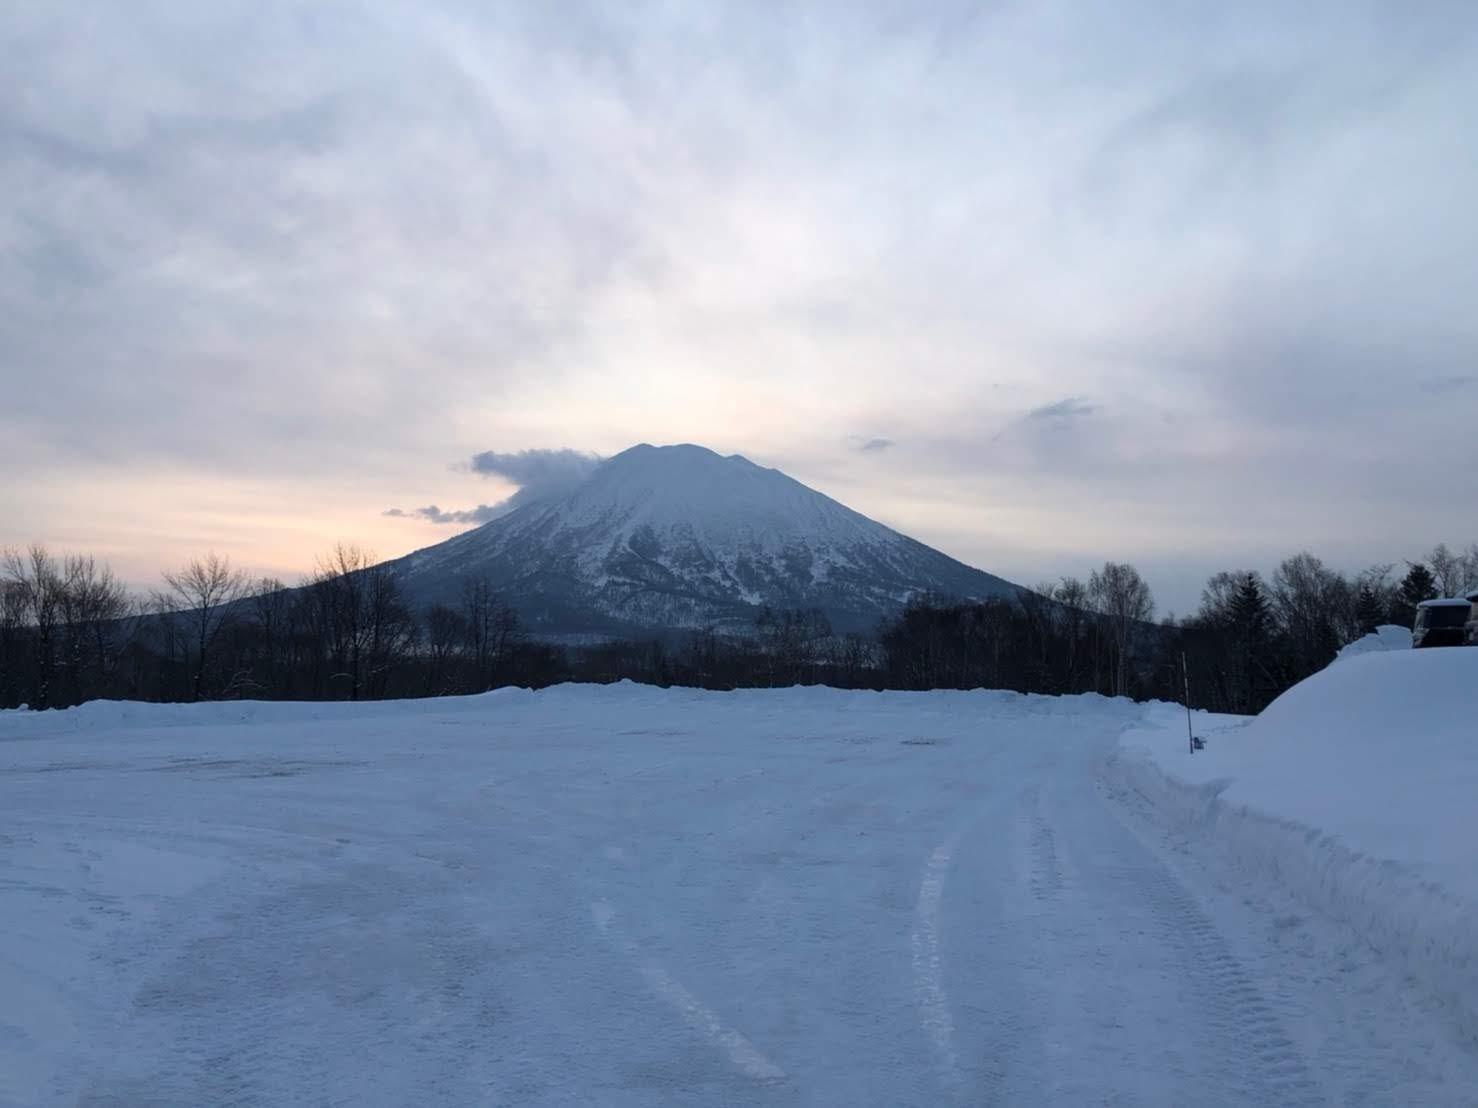 20200204_hokkaido_niseko_snowboard_10.jpg